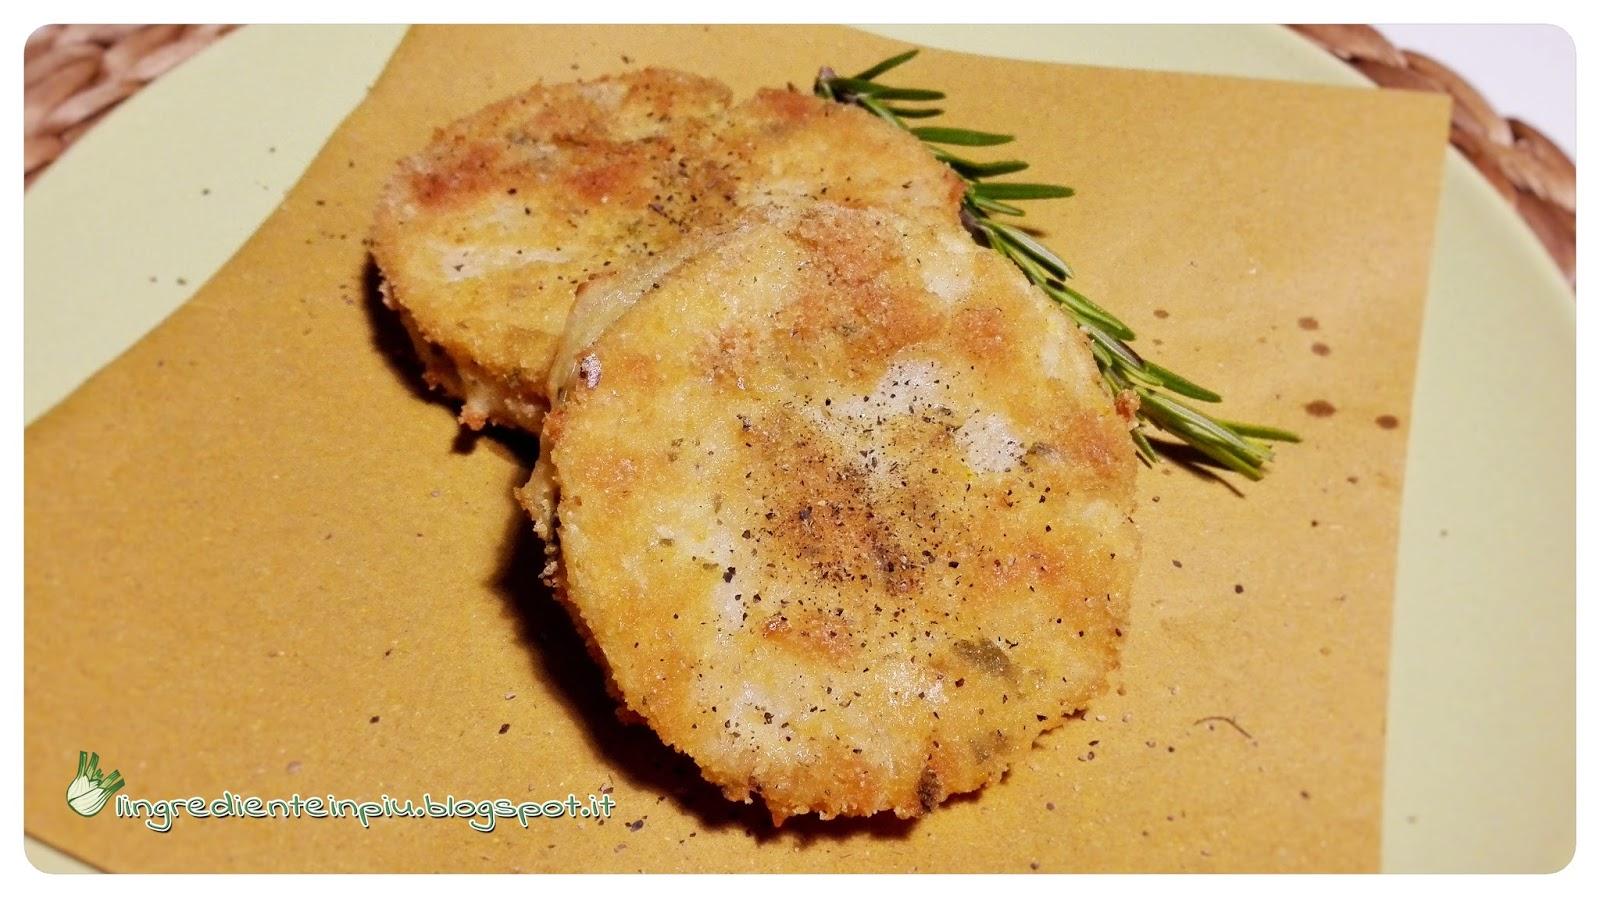 L'ingrediente in più : Cordon bleu di sedano rapa al rosmarino ...